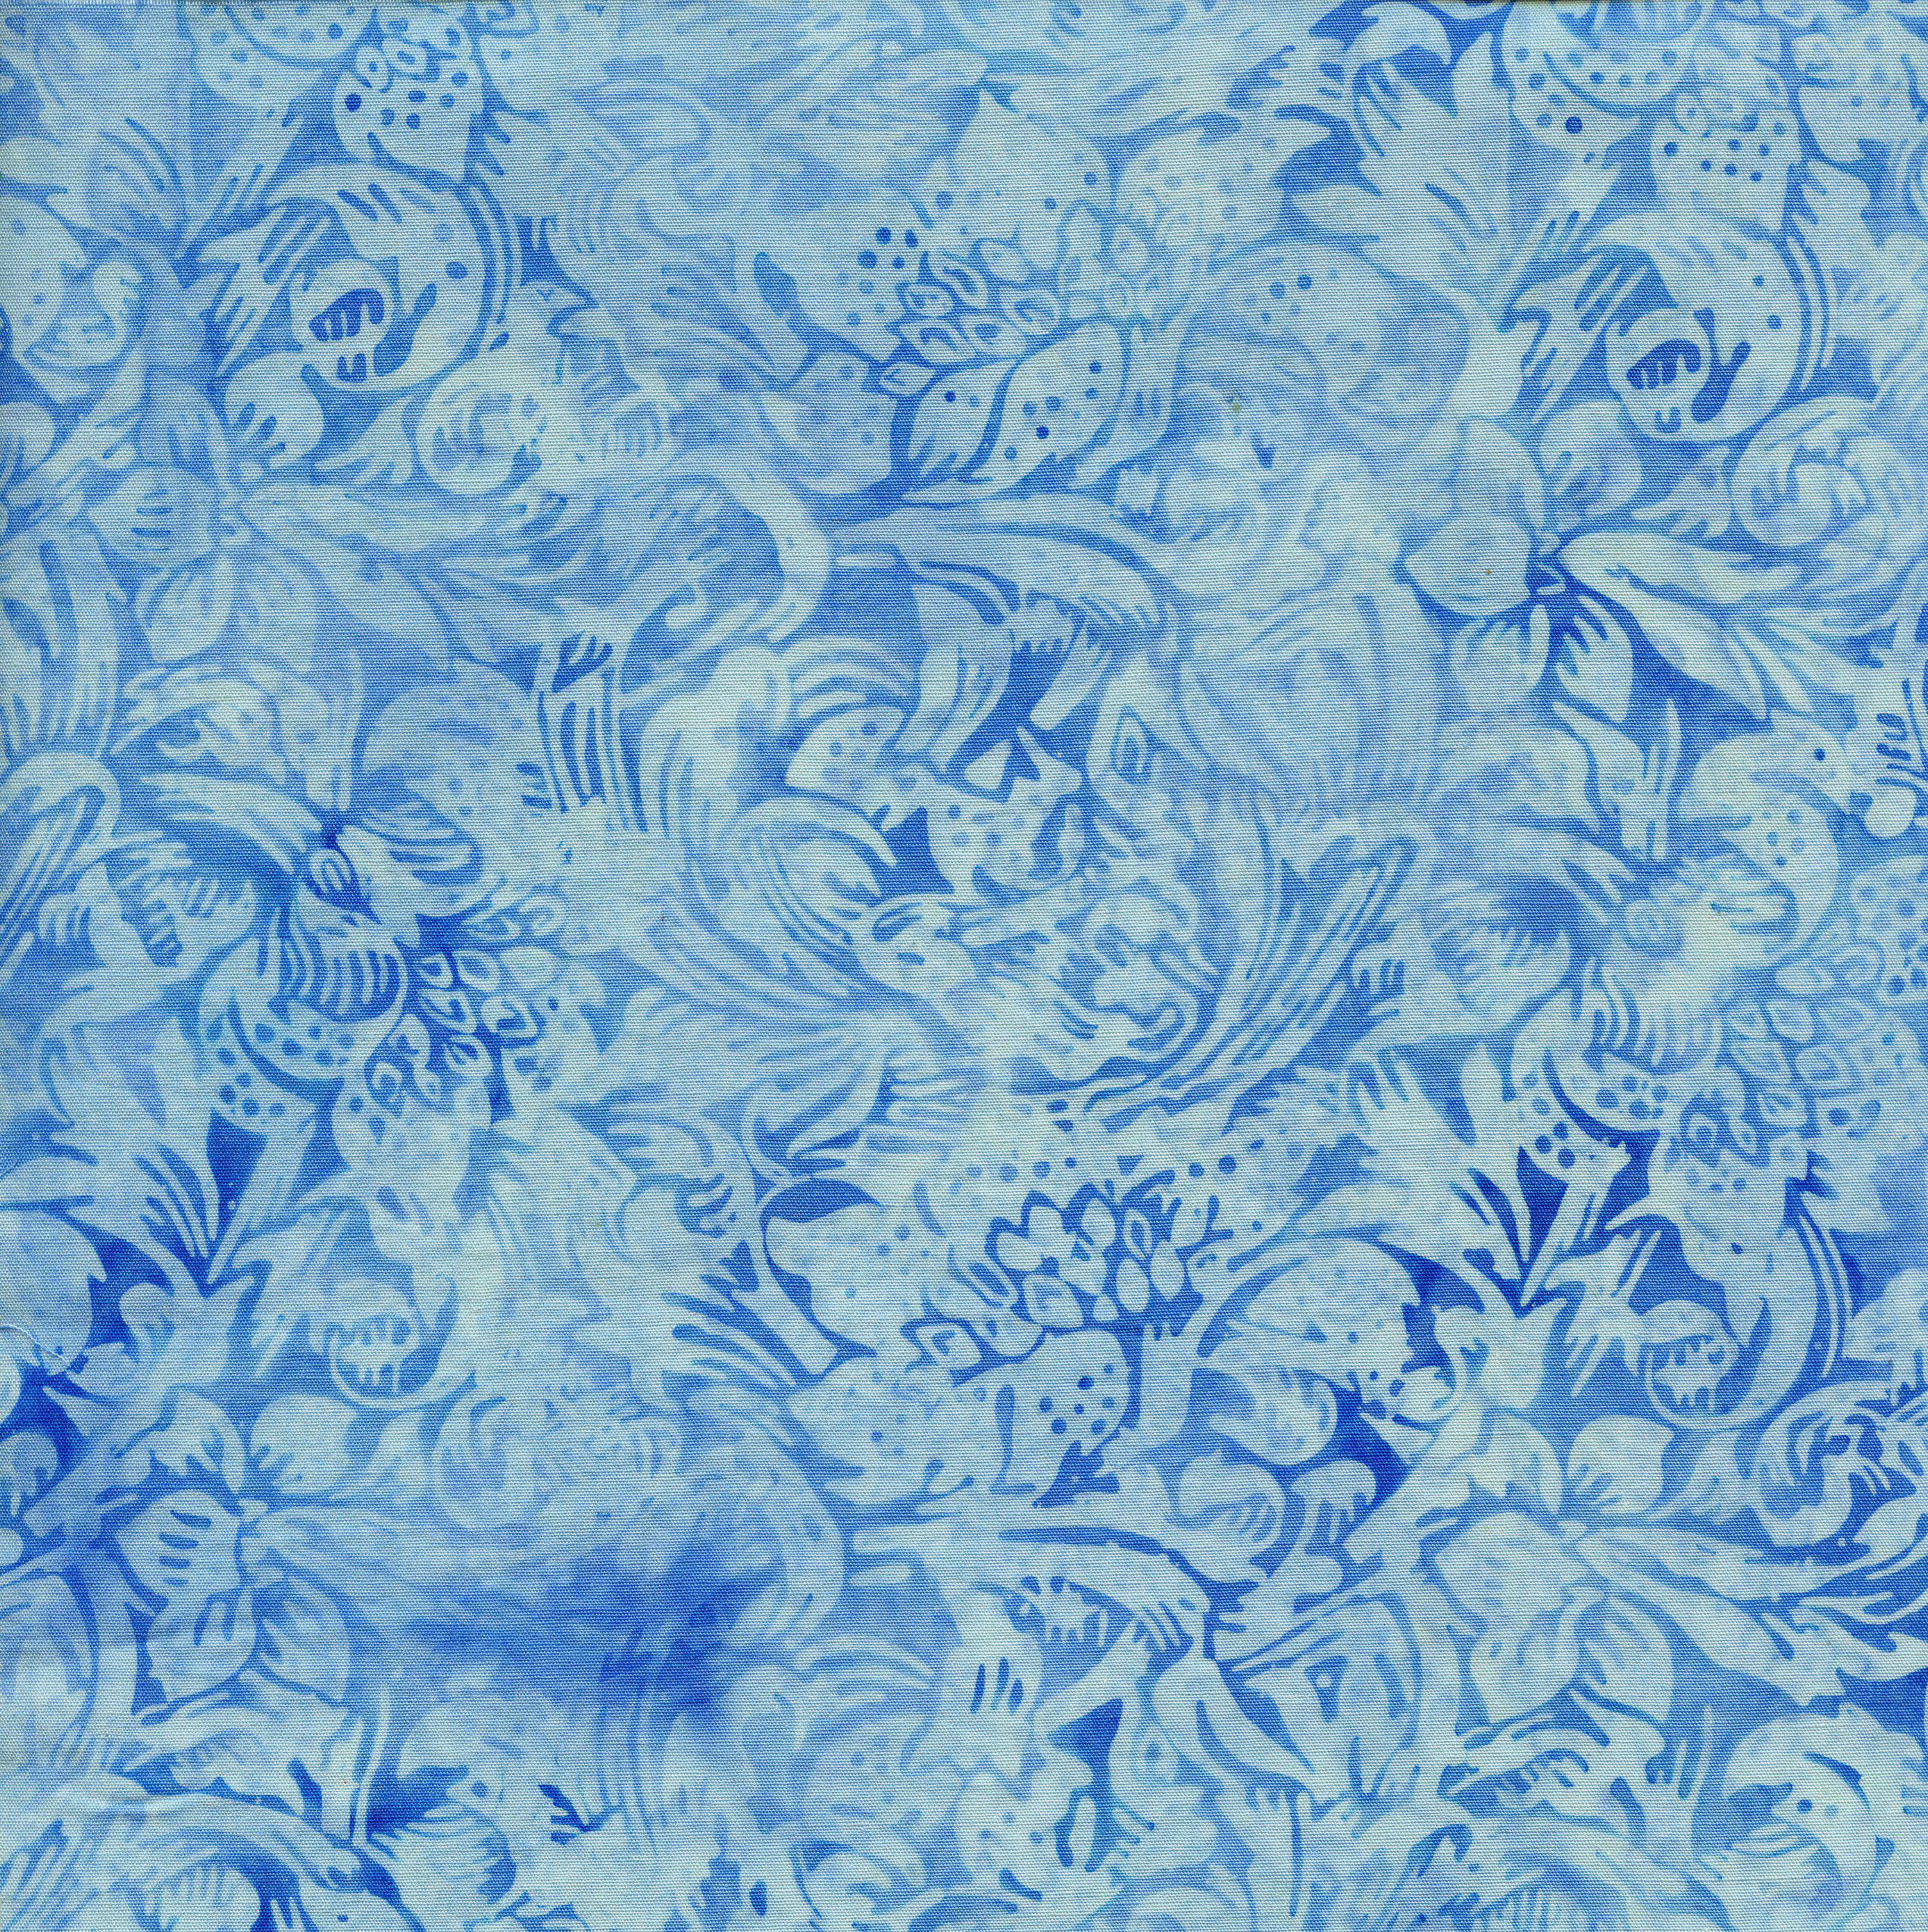 Island Batik LG Floral Vine-French Blue